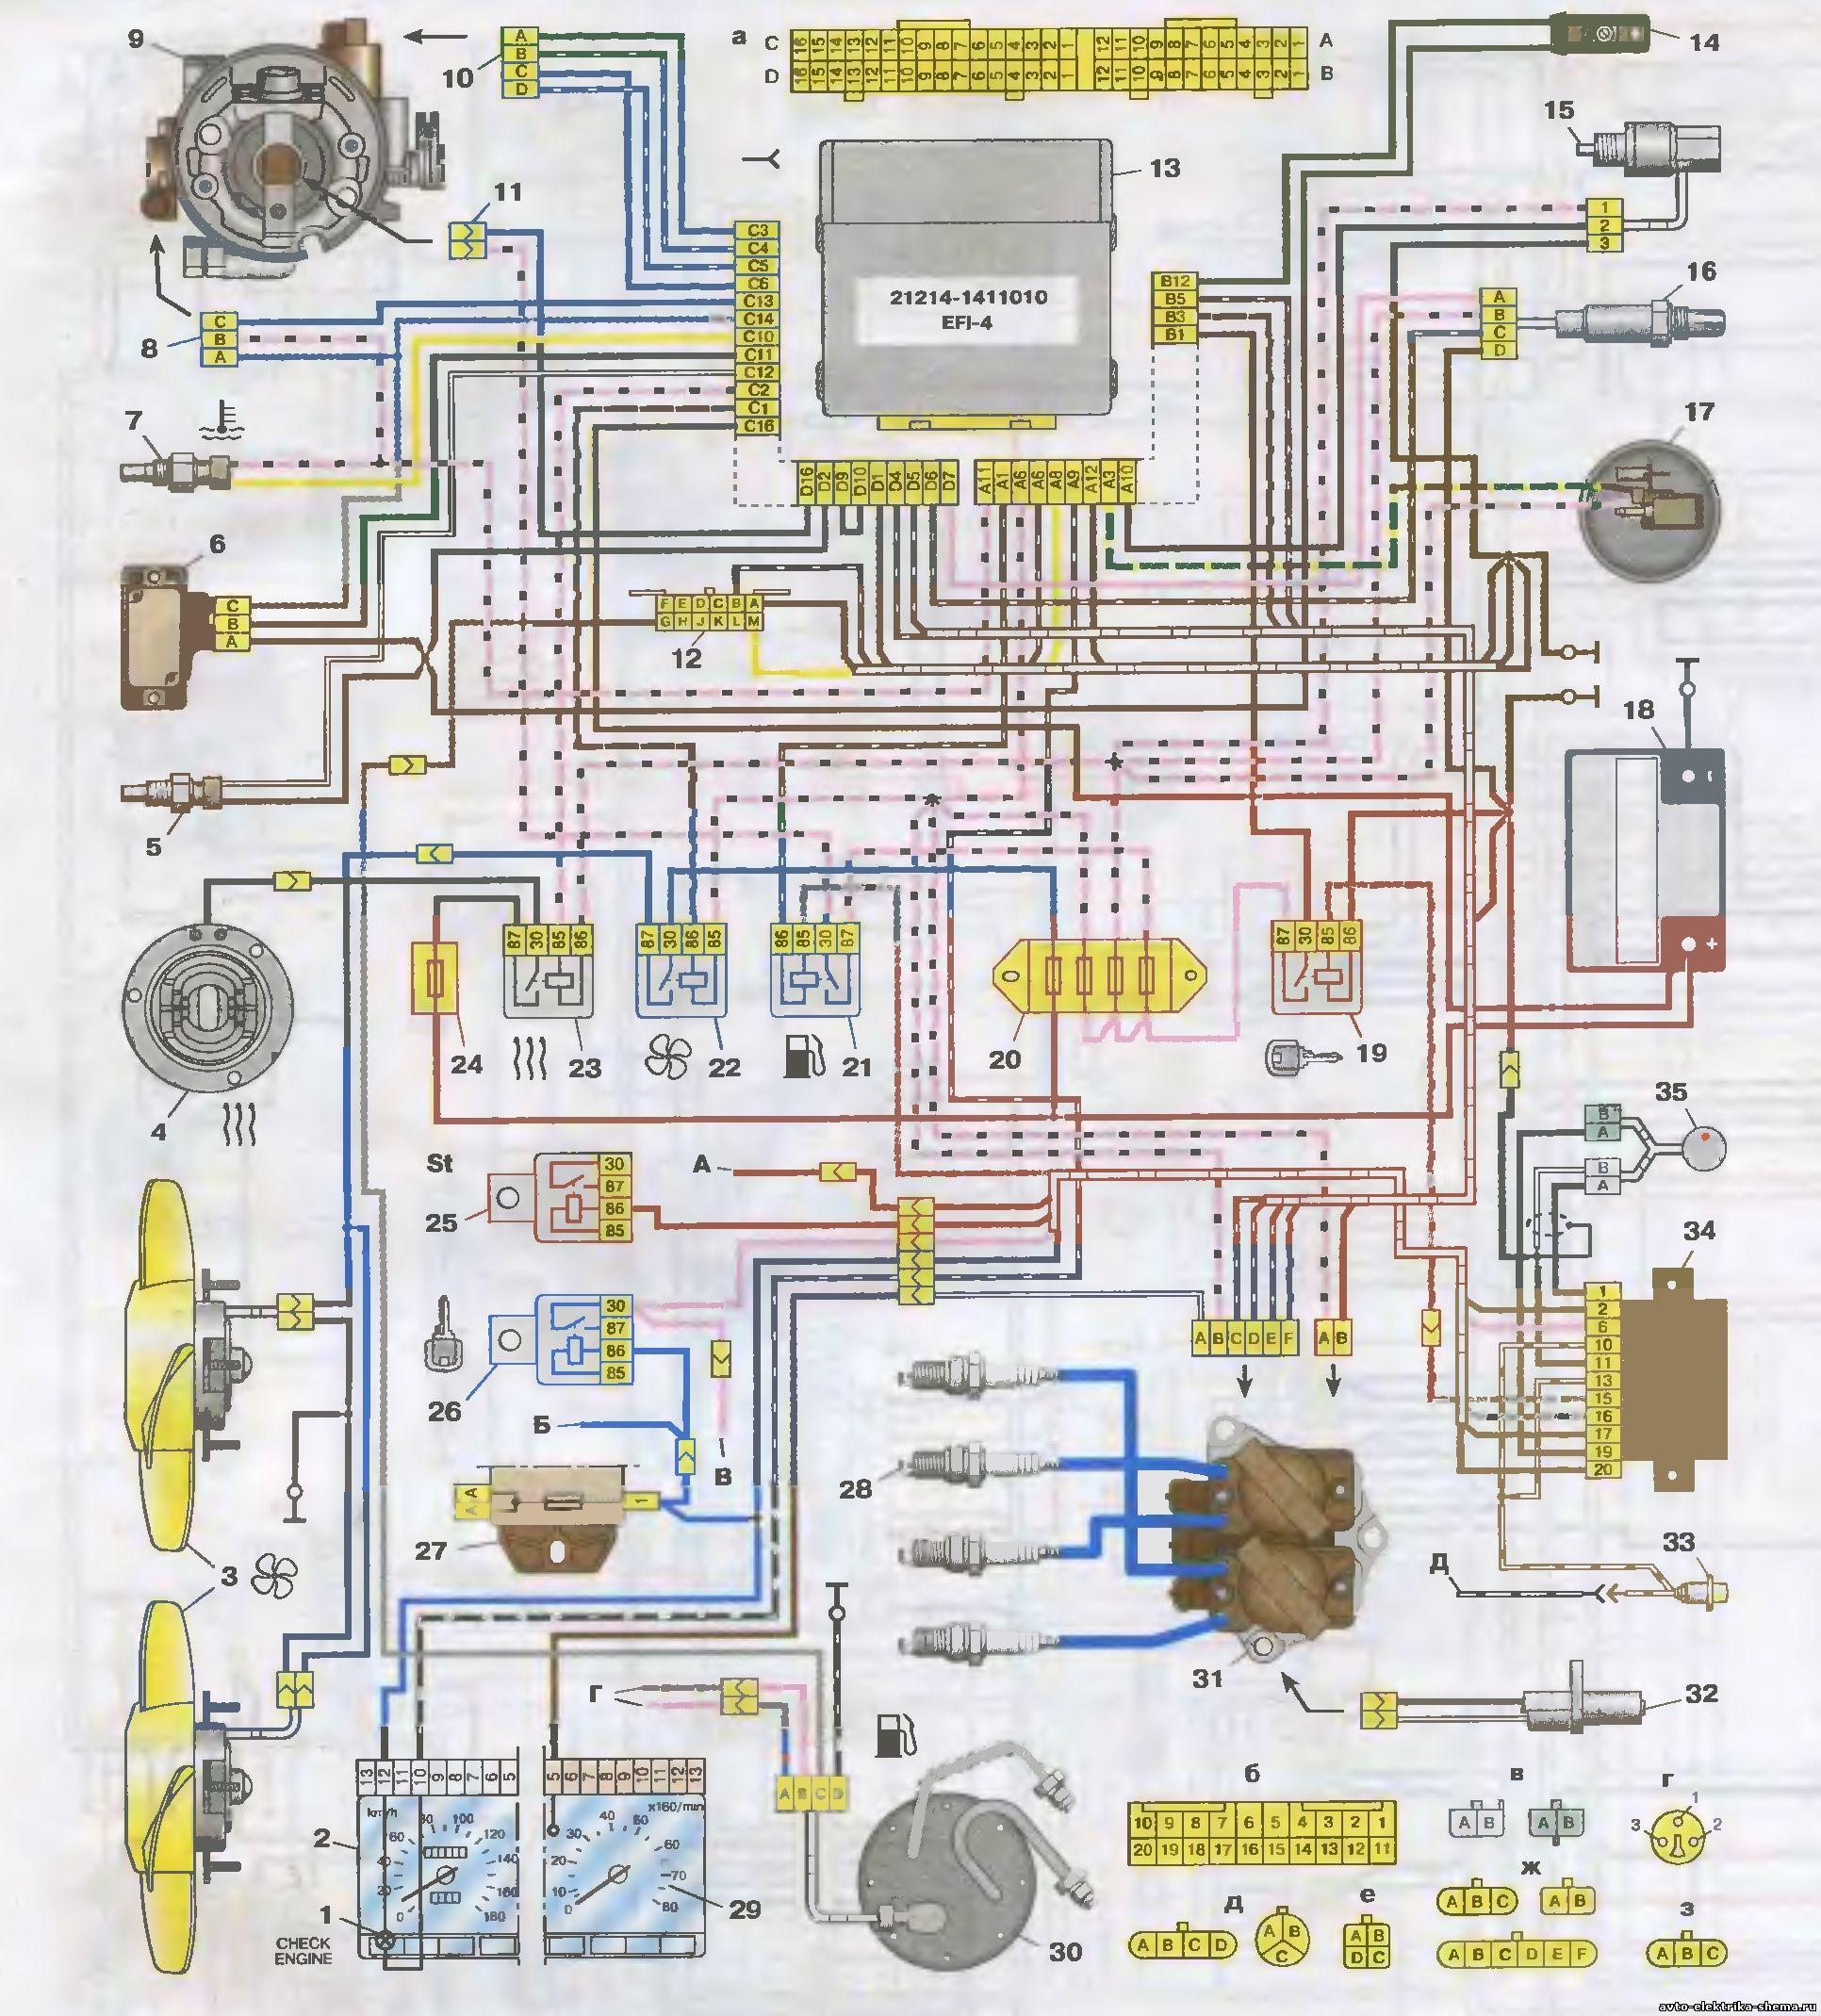 21214 inzh - Схема электрооборудования ваз 2121 нива карбюратор